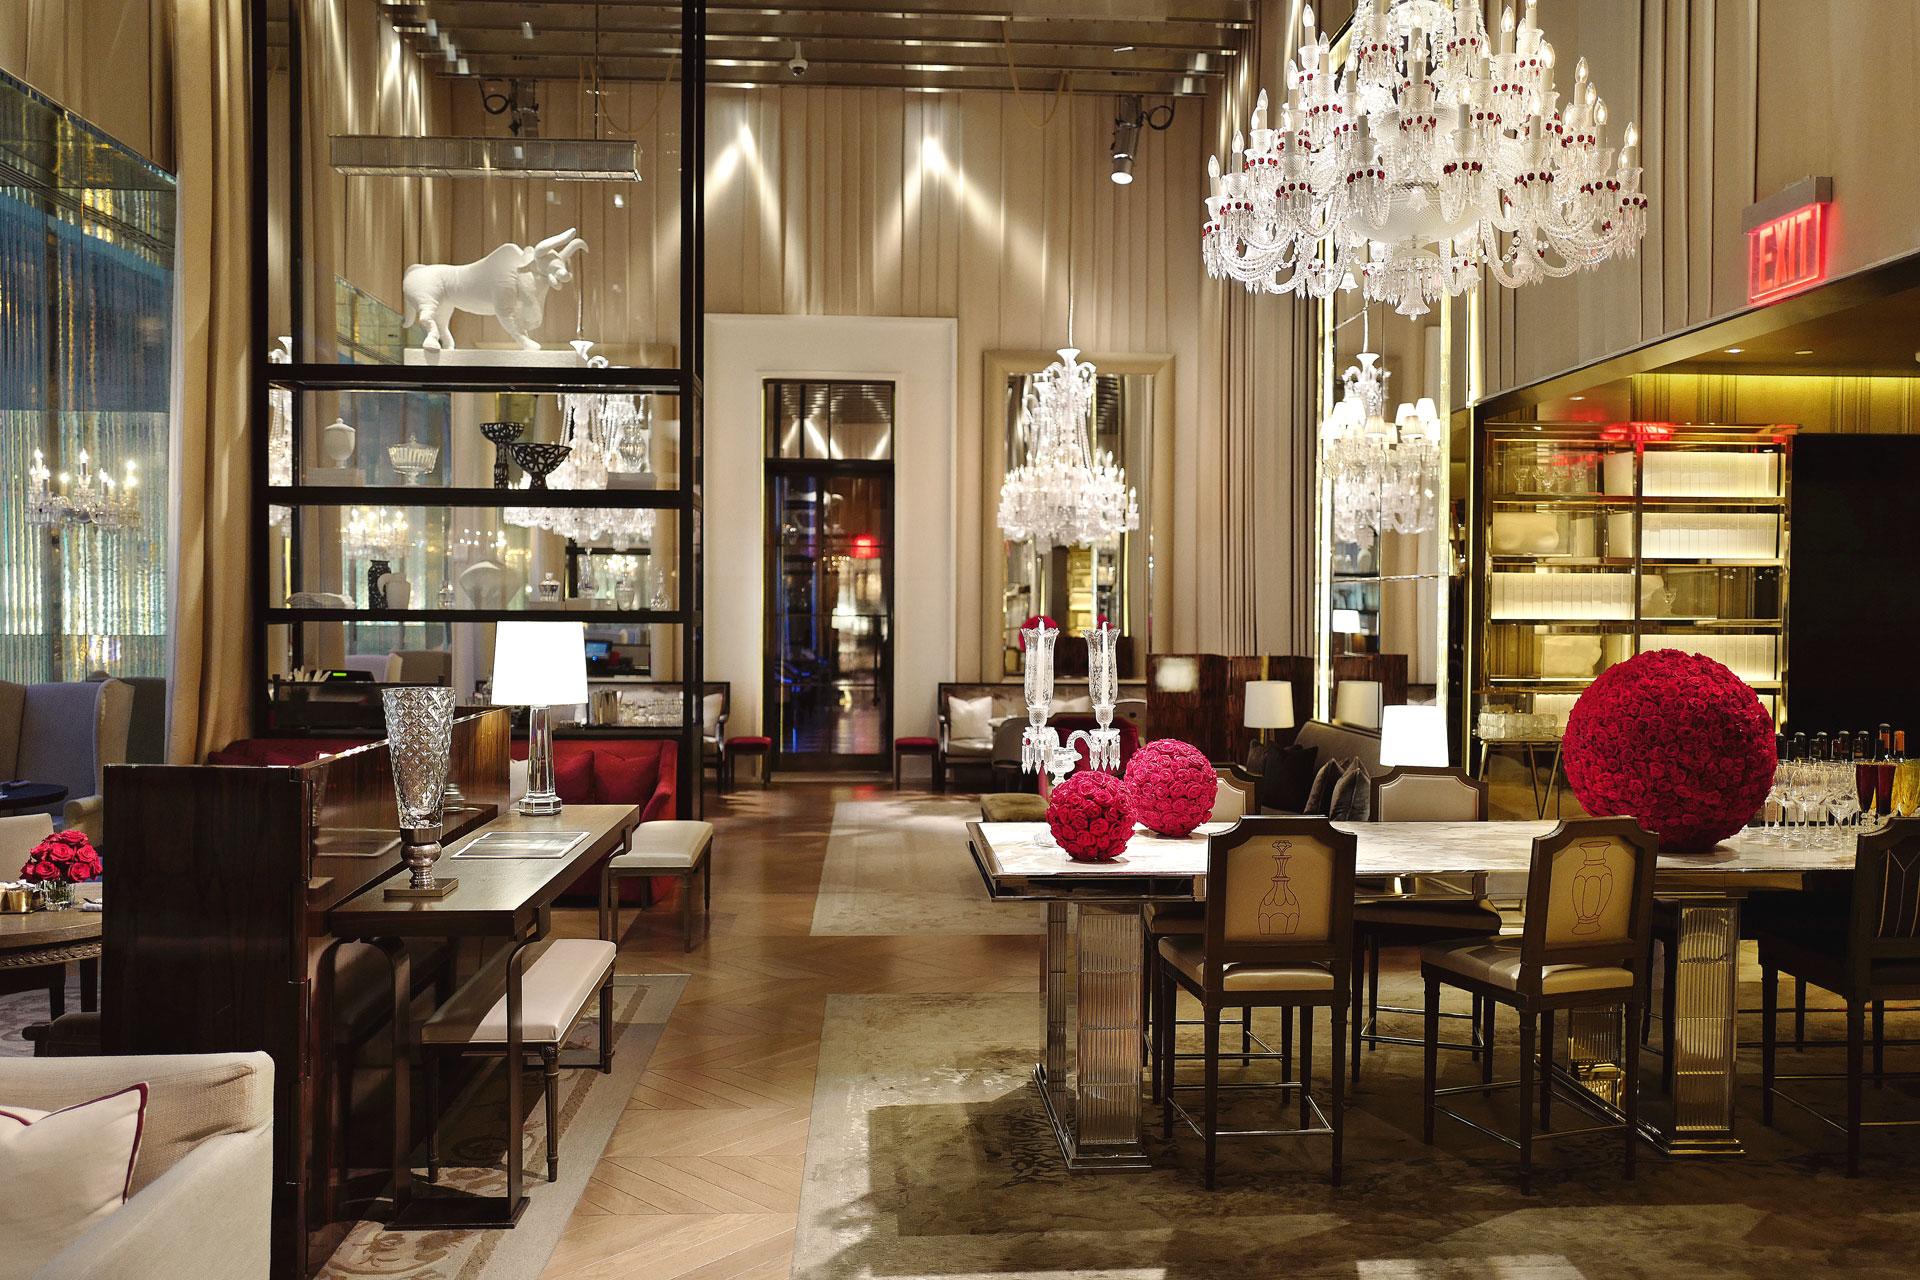 le-gran-salon-baccarat-hotel-nyc.jpg